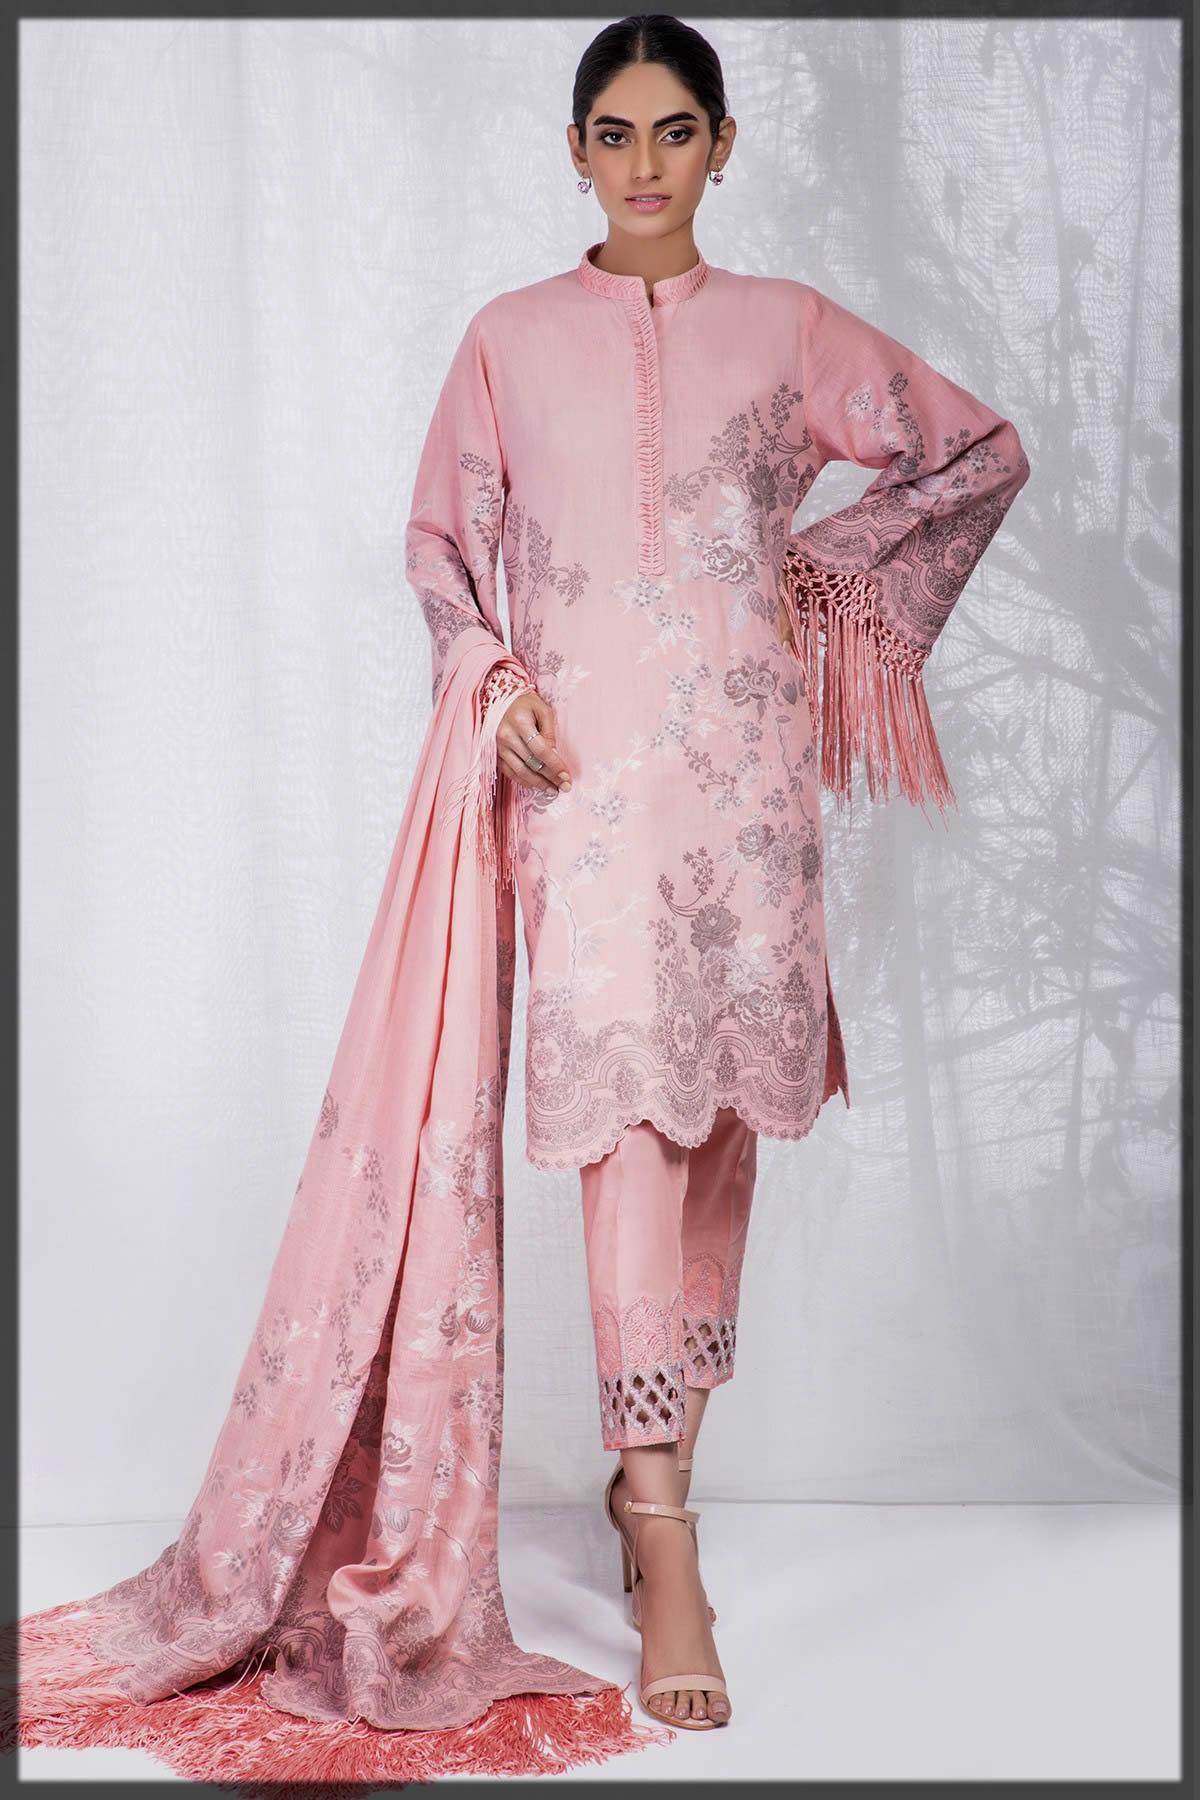 lovely pink jacquard summer dress